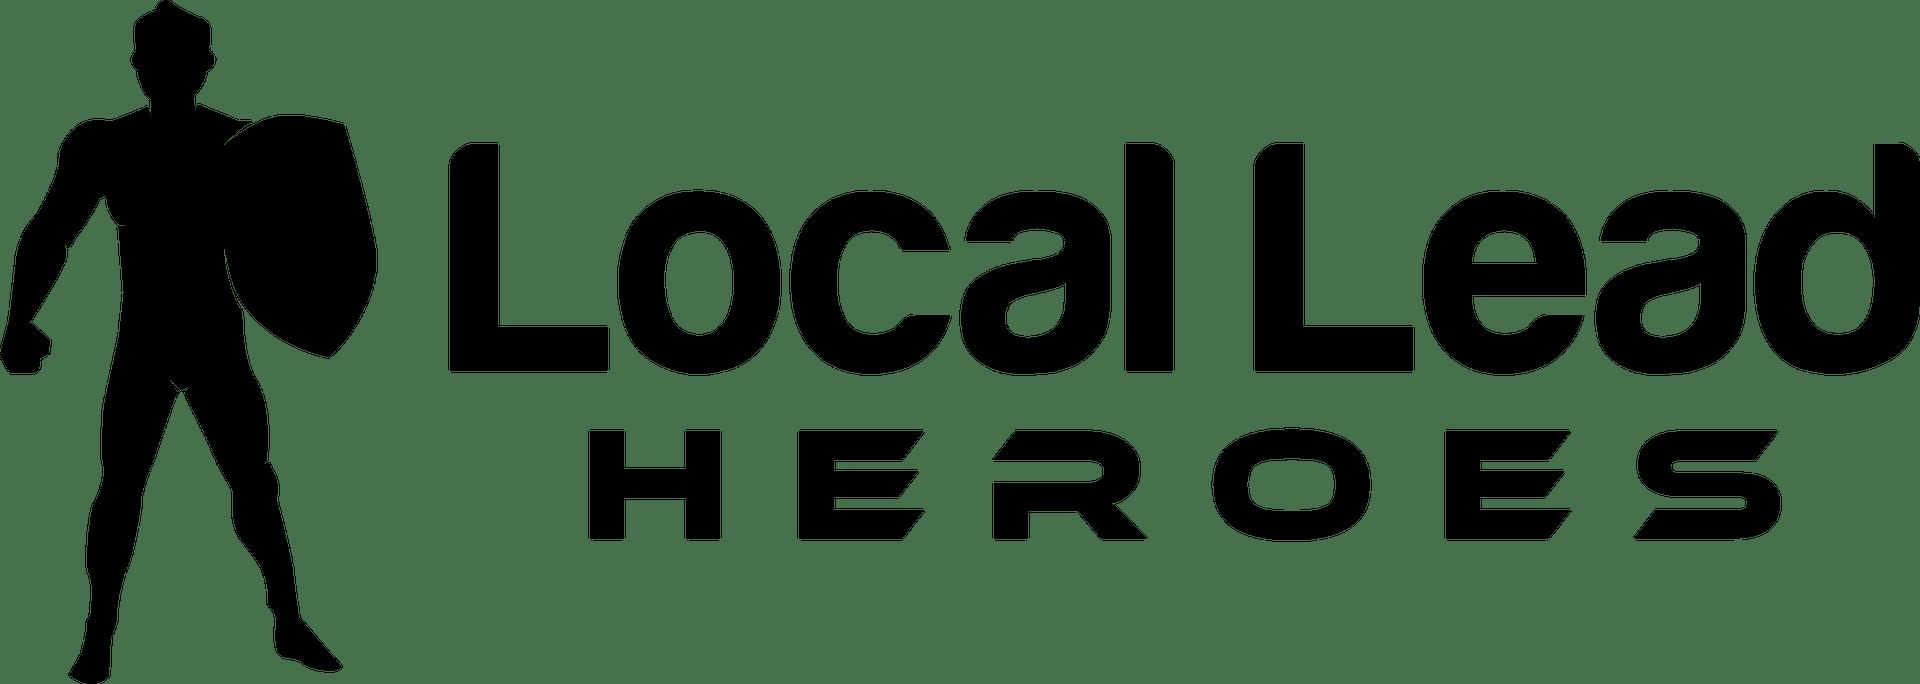 local citations